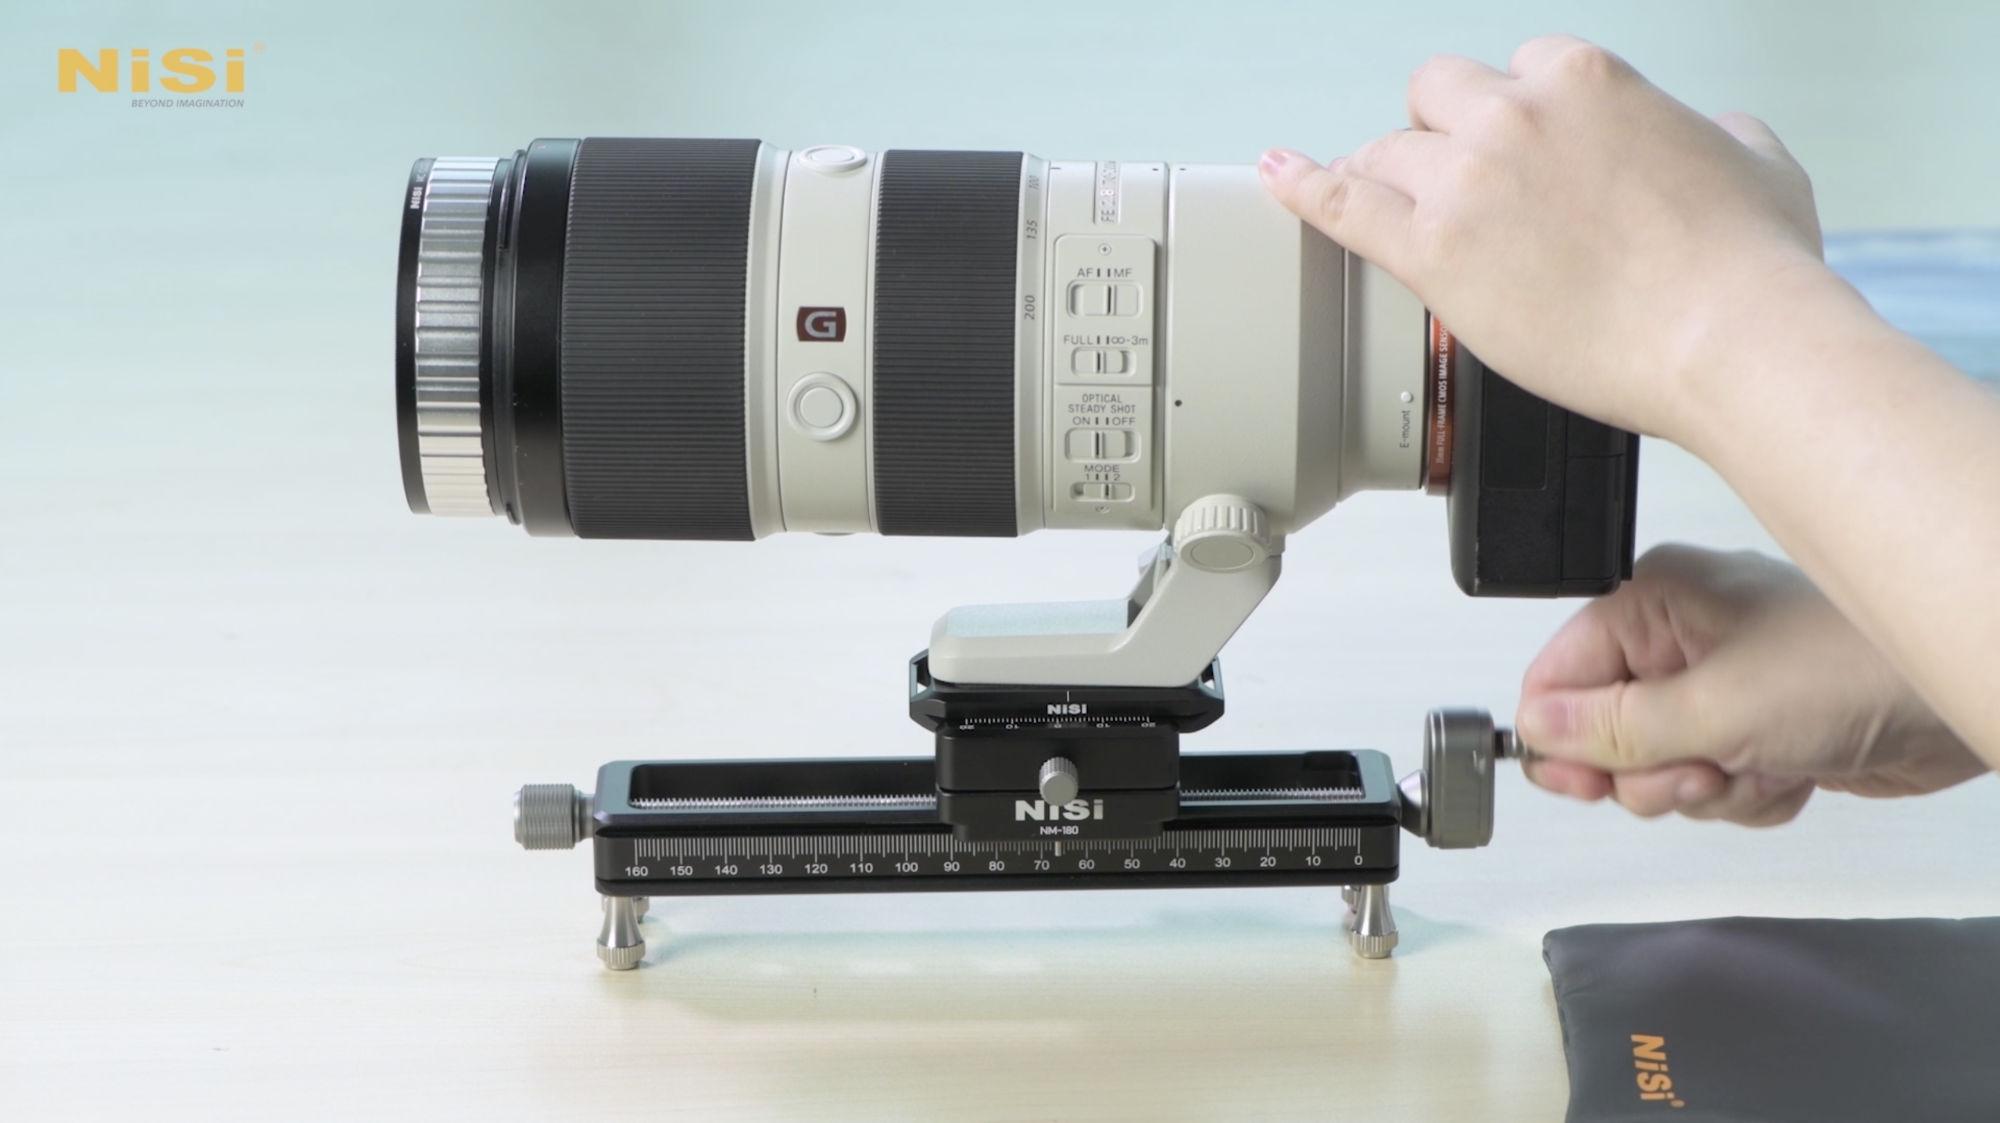 NiSi Macro Focusing Rail with Camera